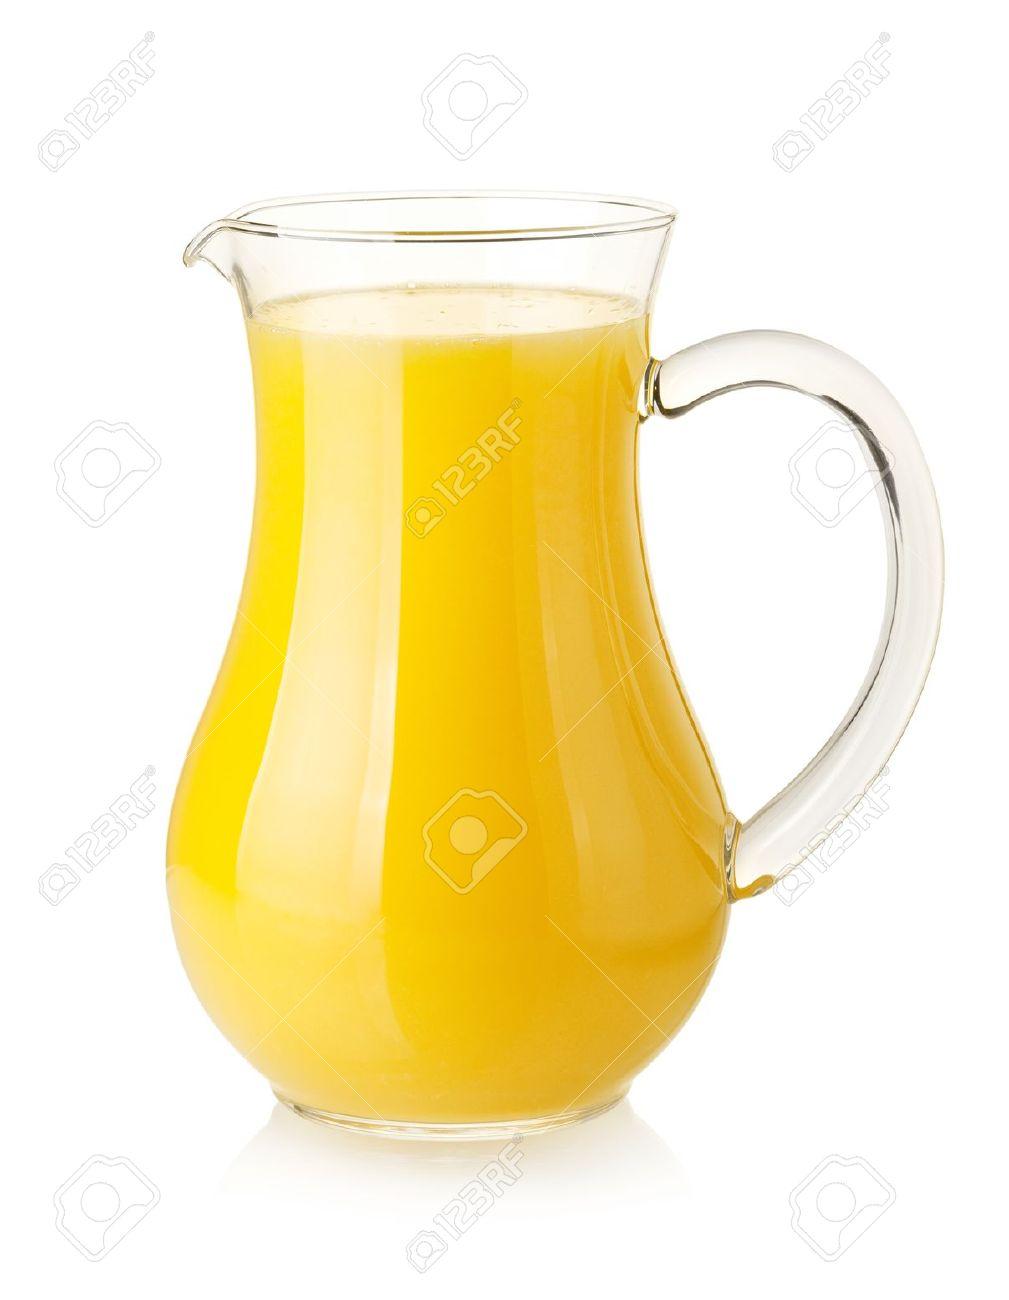 juice pitcher - orange juice in pitcher isolated on white background stock photo